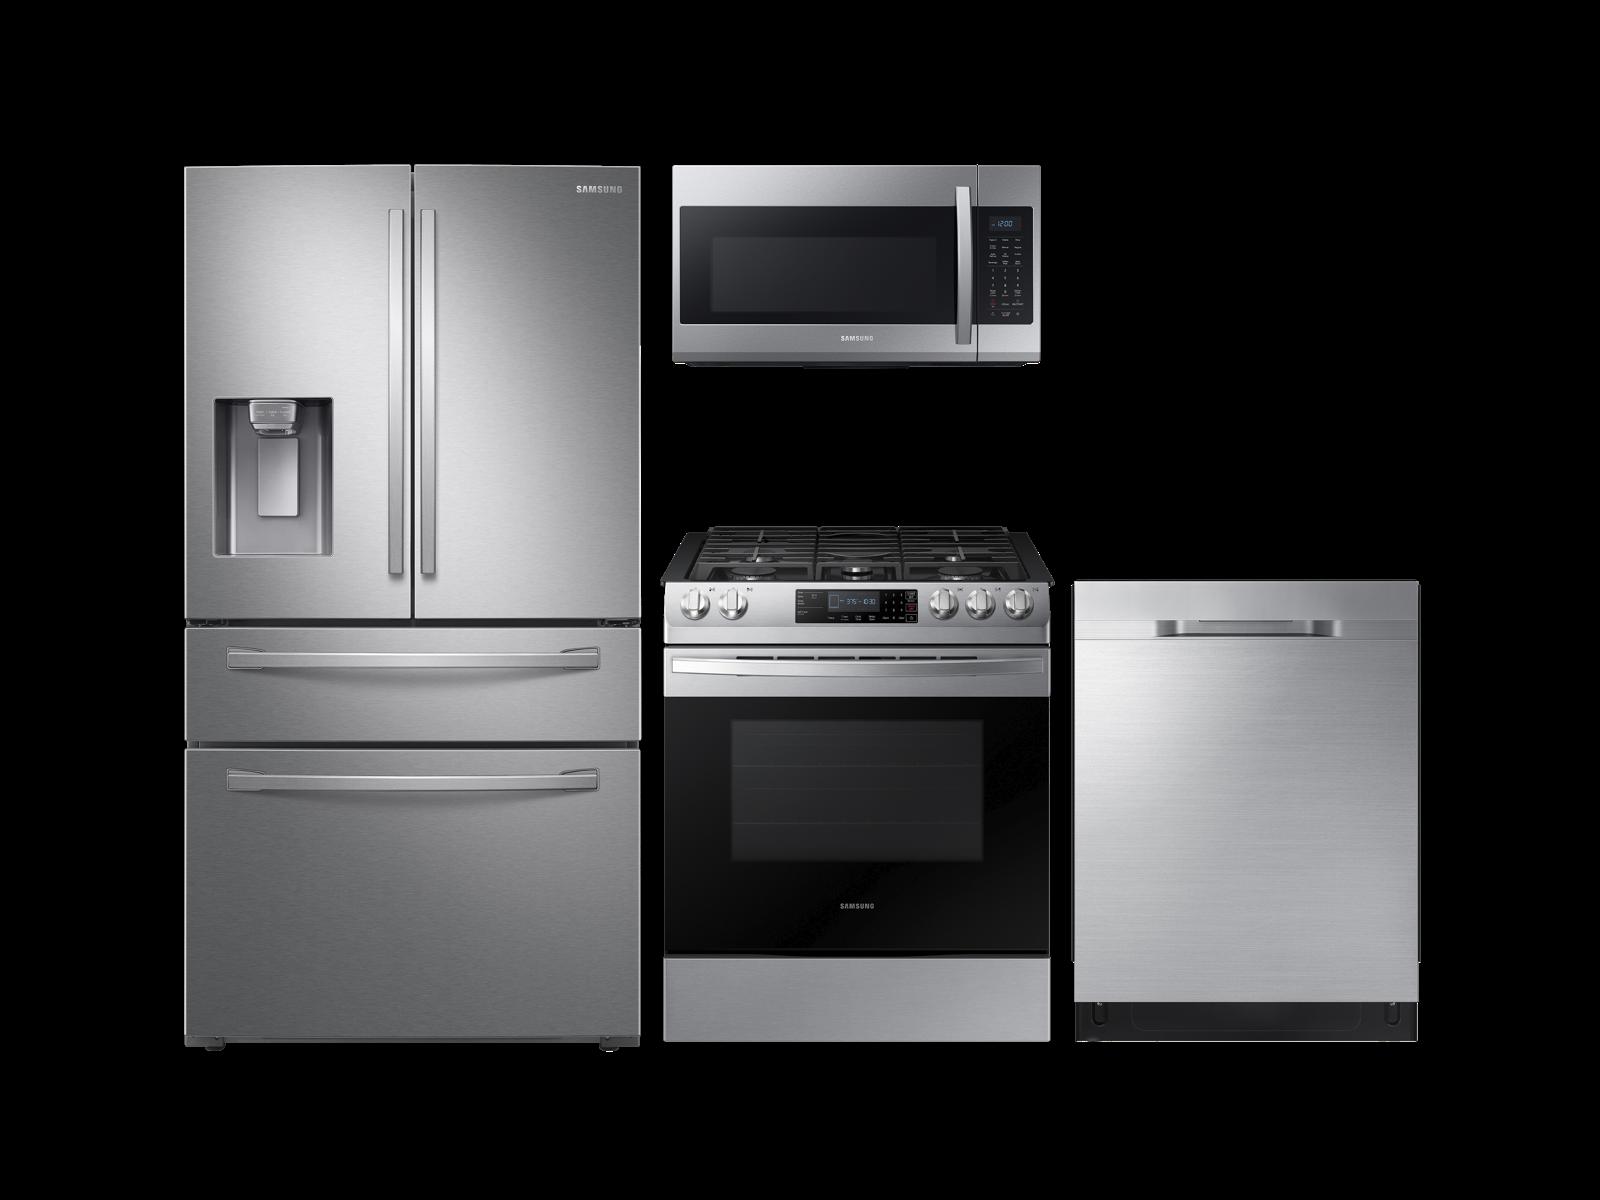 Modern built-in design with gas range